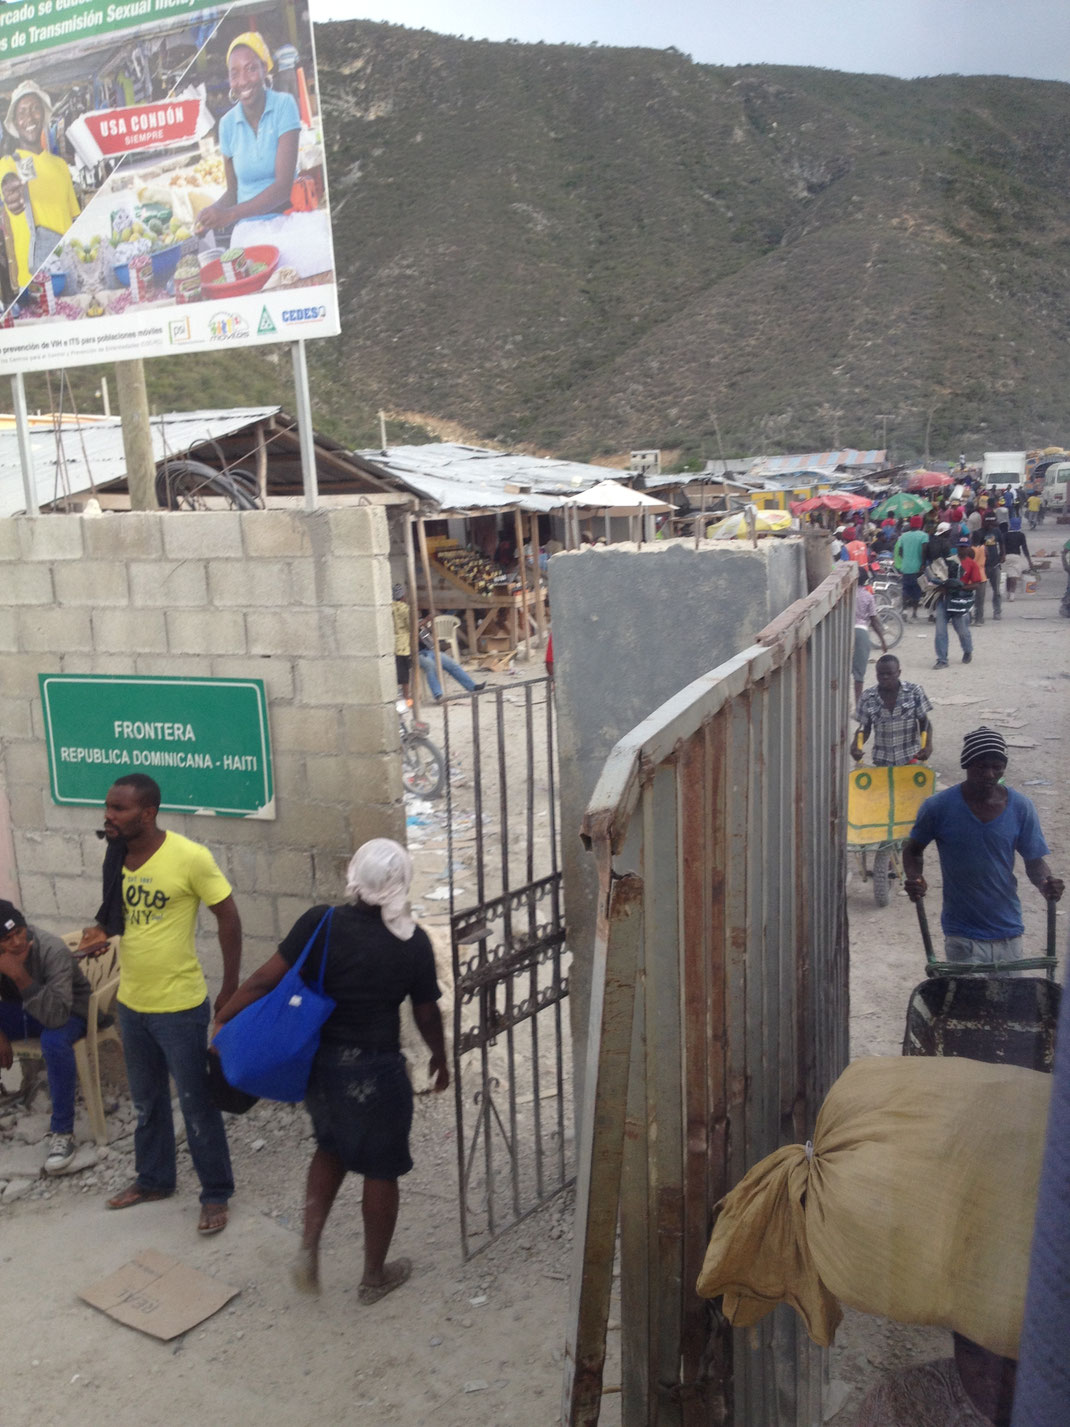 Dom Rep, Dominikanische Republik, Frontera, Grenze, Haiti, Caribe Tours